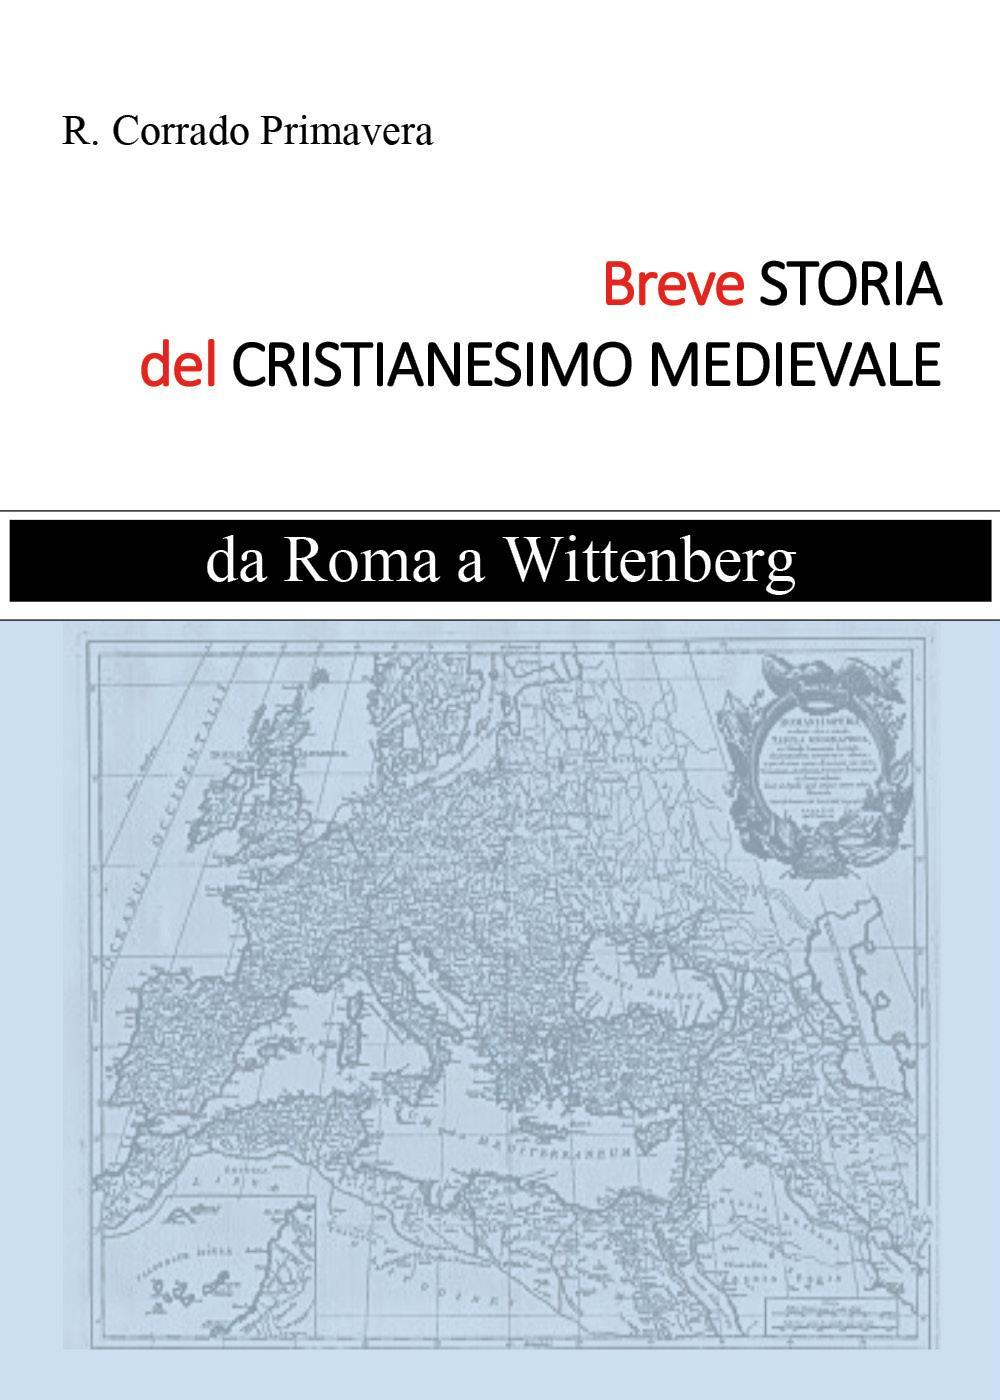 Breve Storia del Cristianesimo Medievale